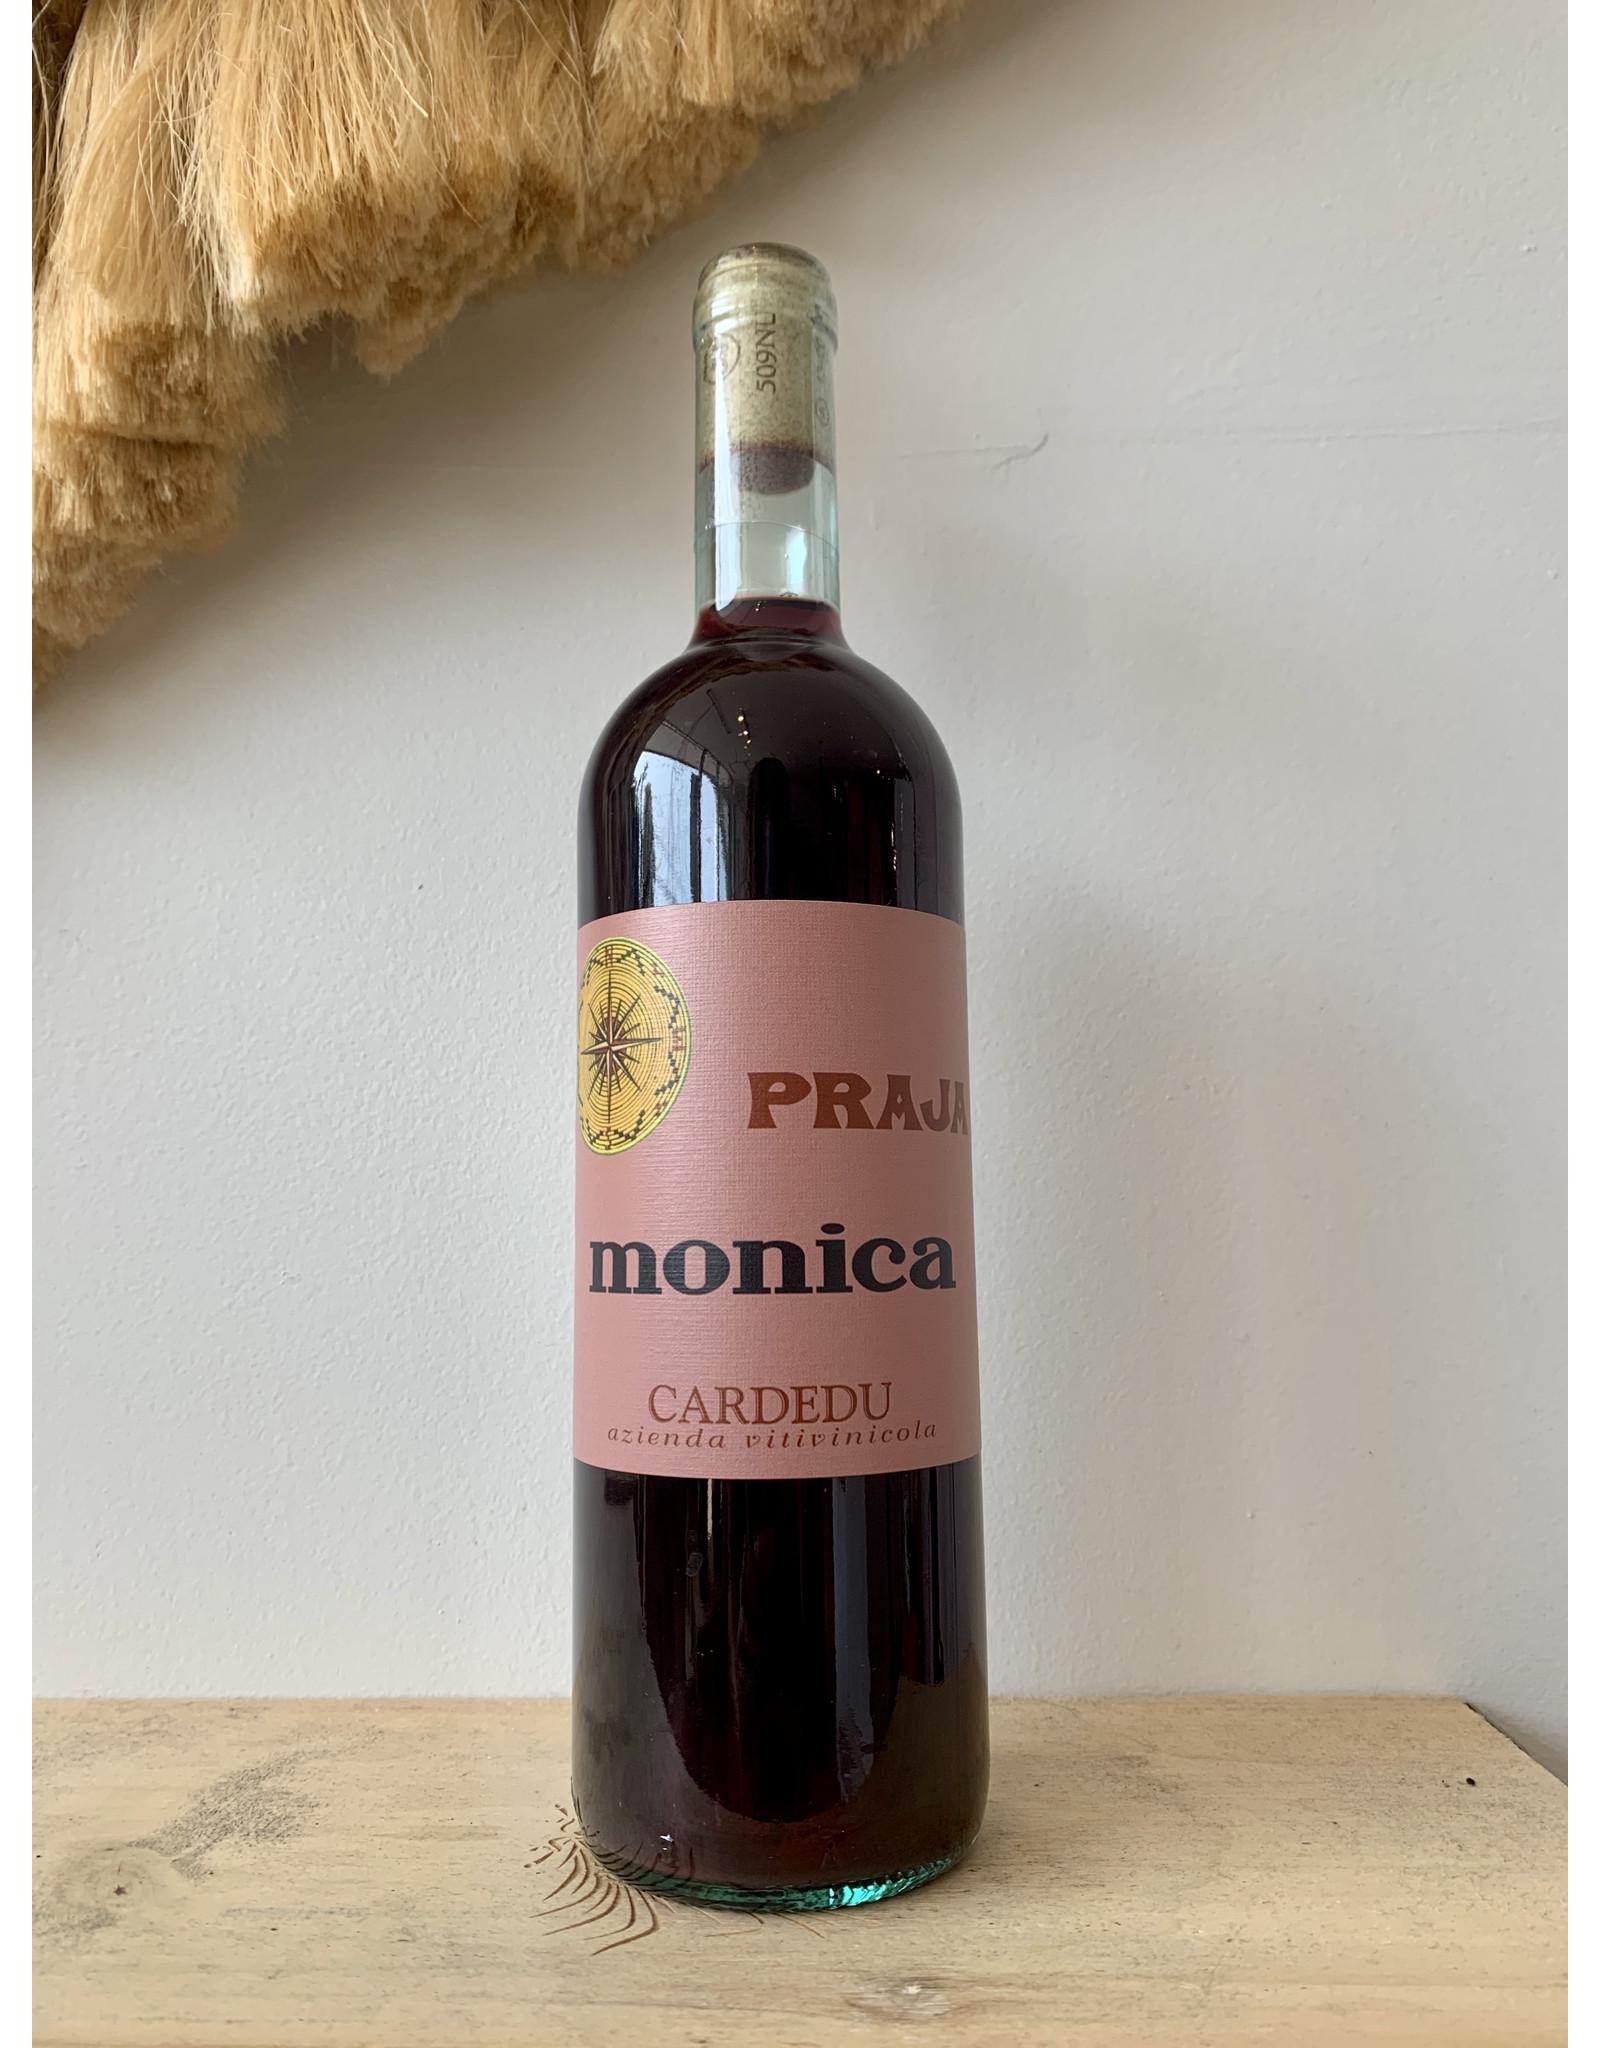 Cardedu Praja Monica 2019